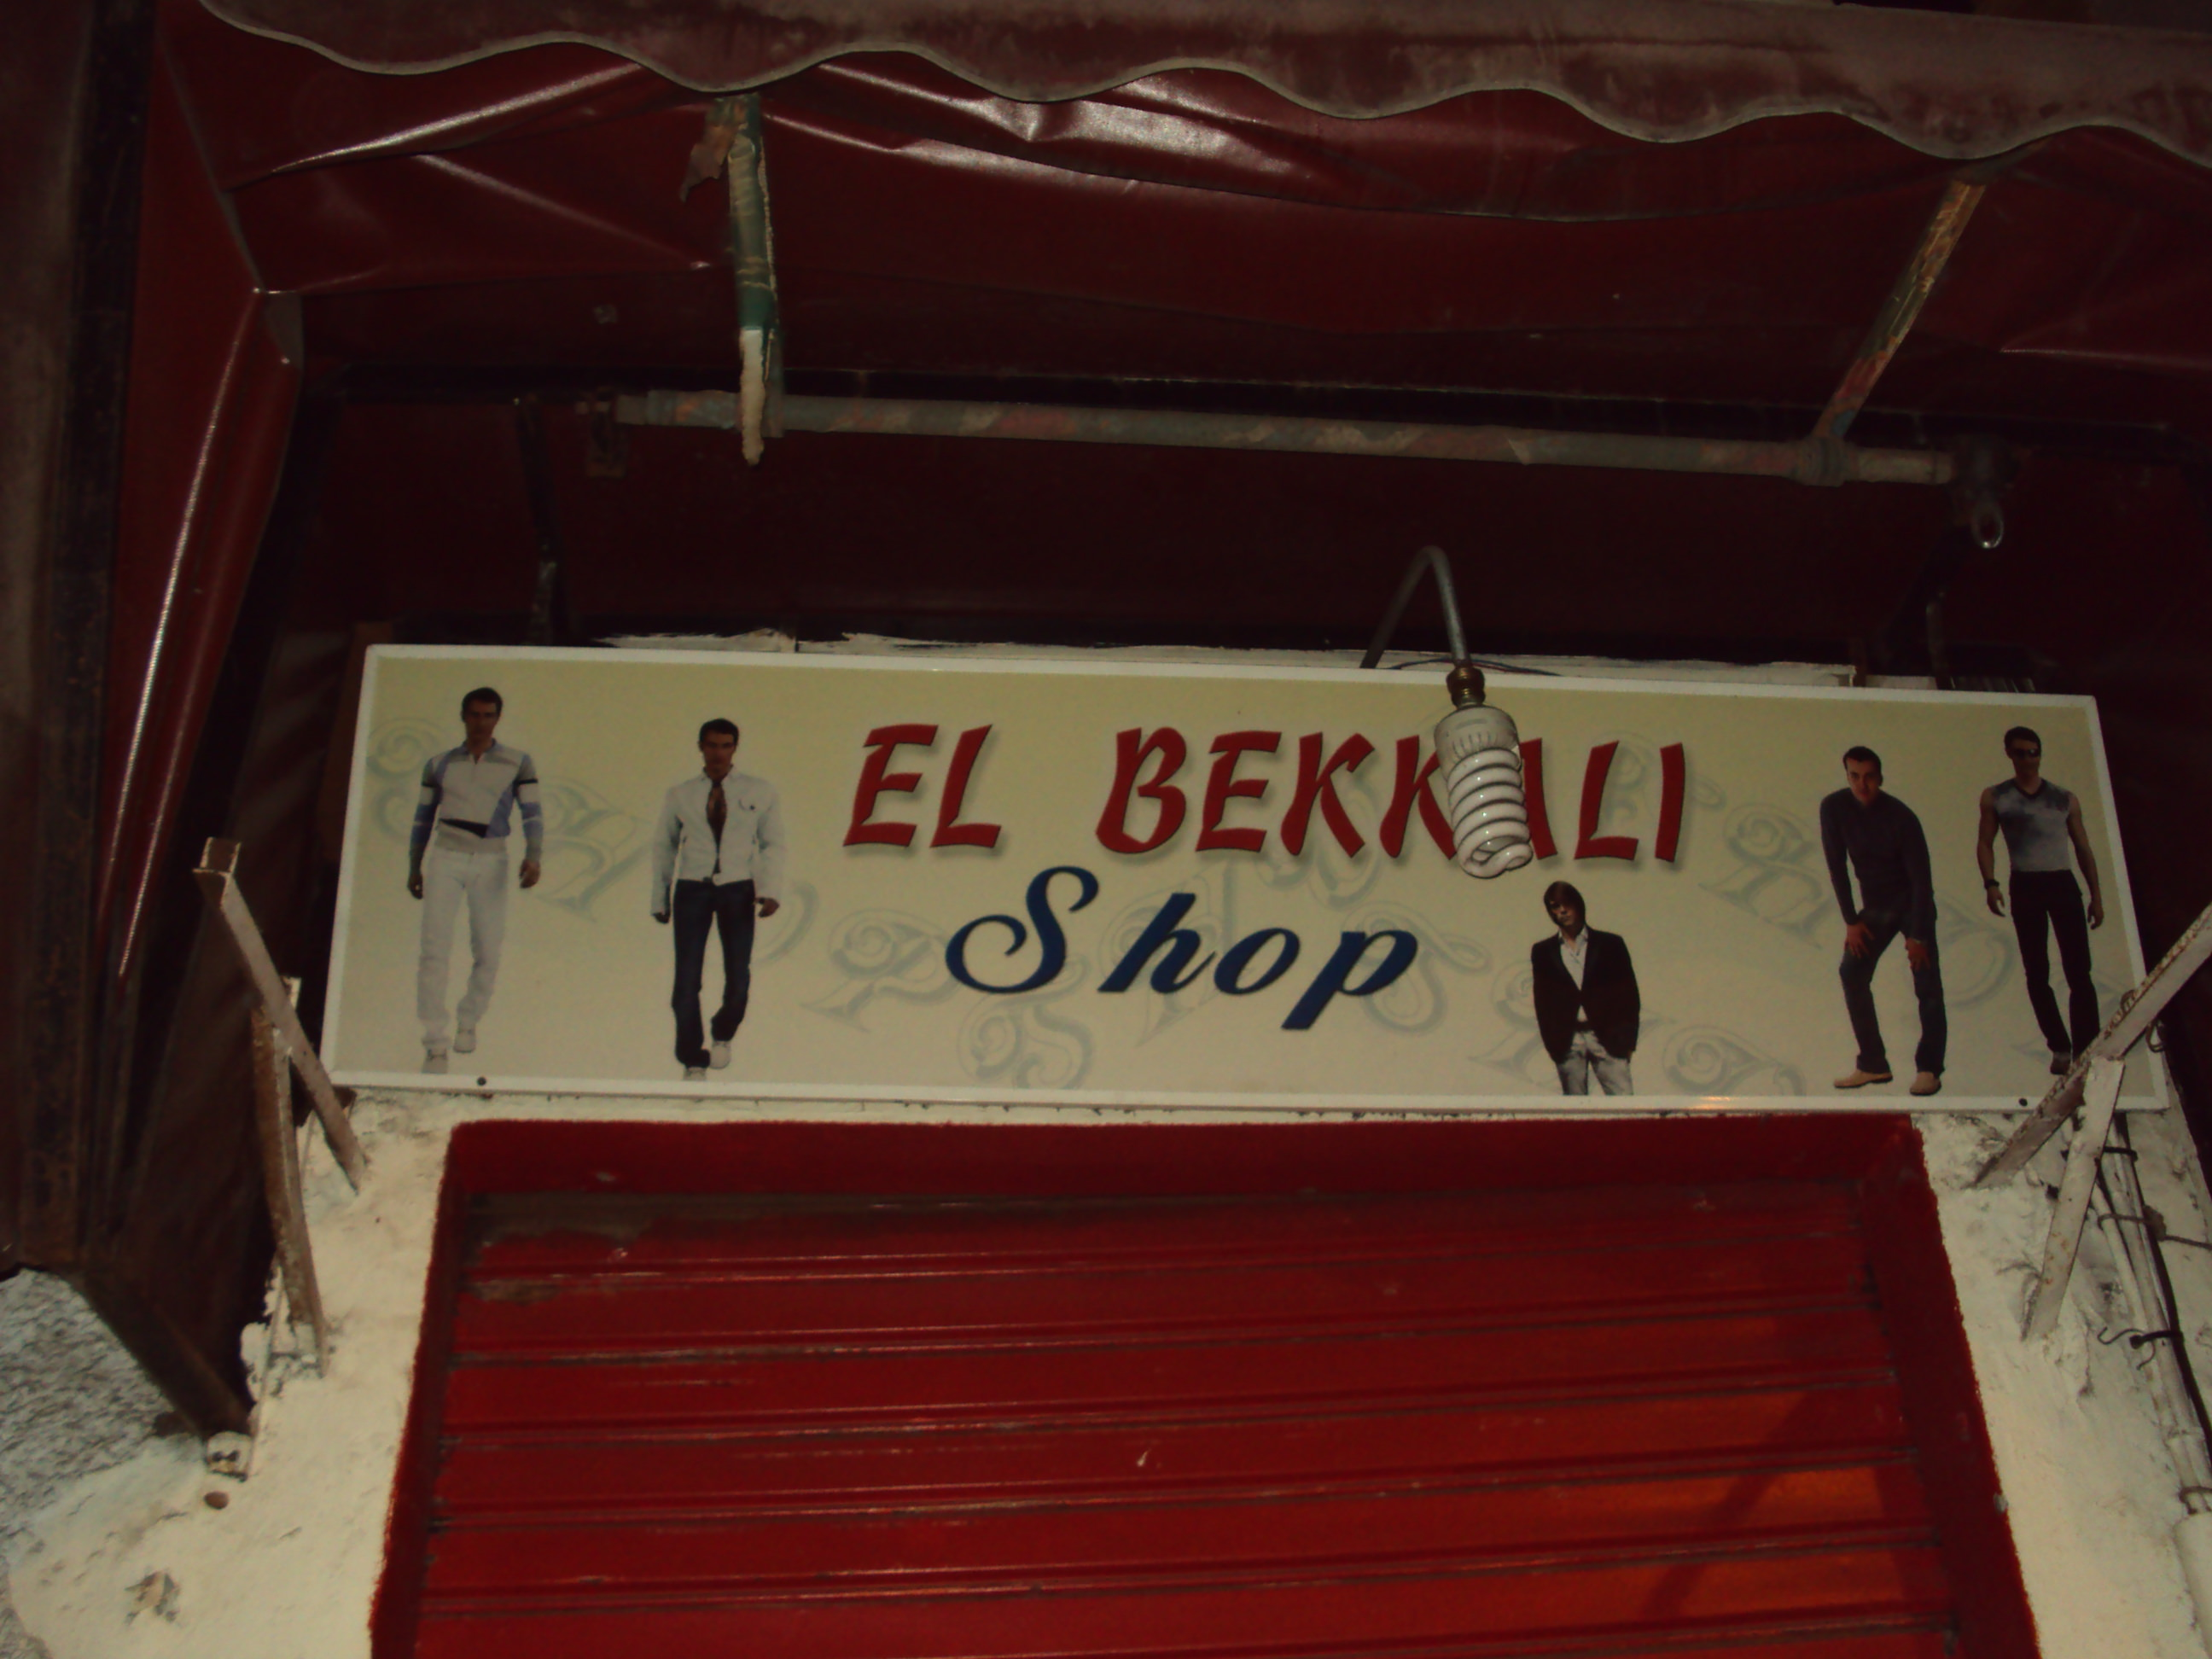 El Bekkali